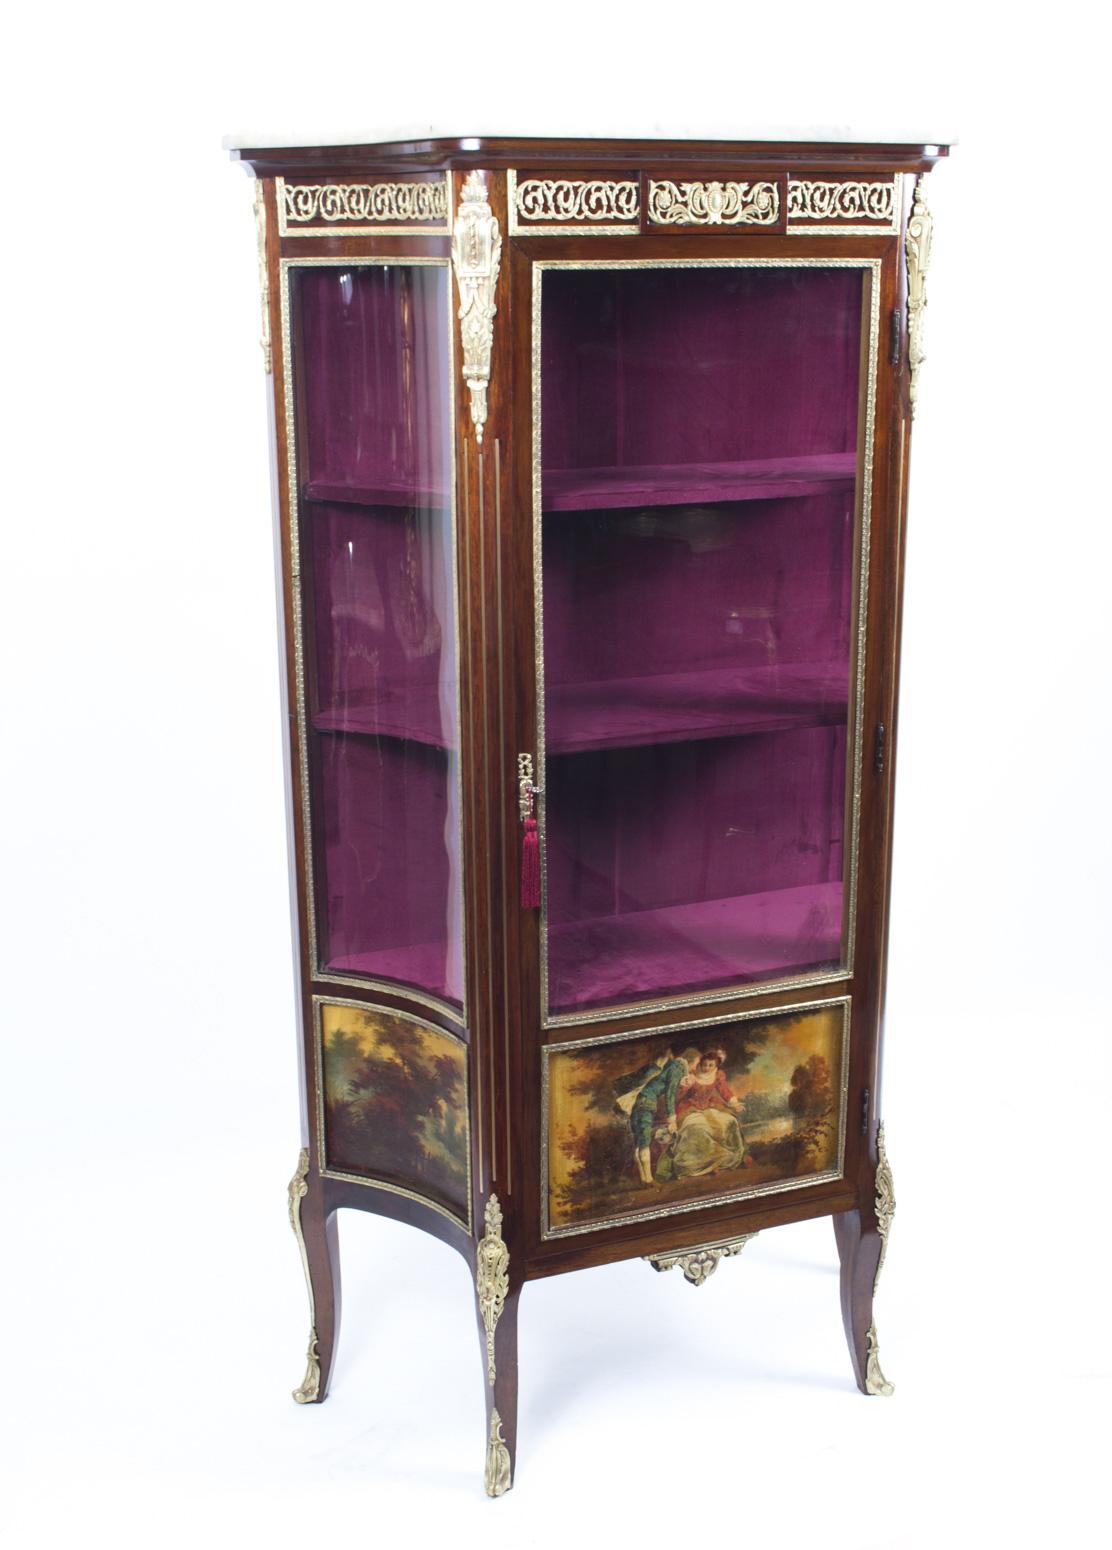 Antique French Vernis Ref No 07127 Regent Antiques